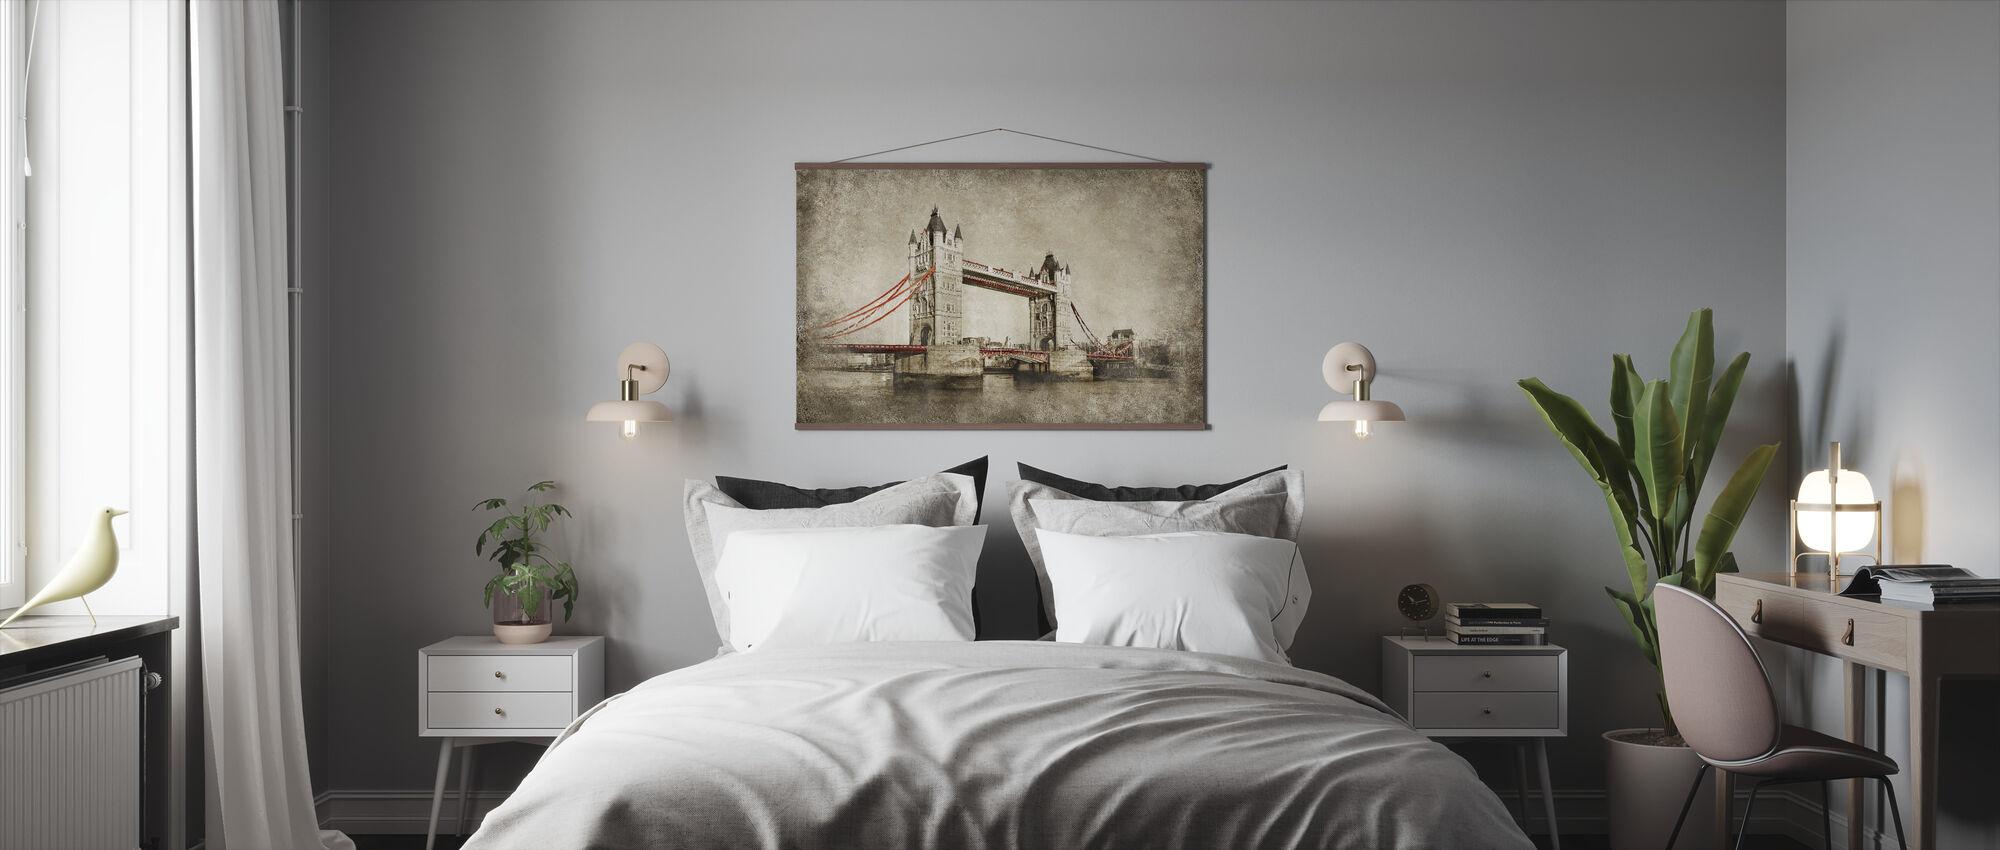 Tower Bridge - London - Poster - Bedroom